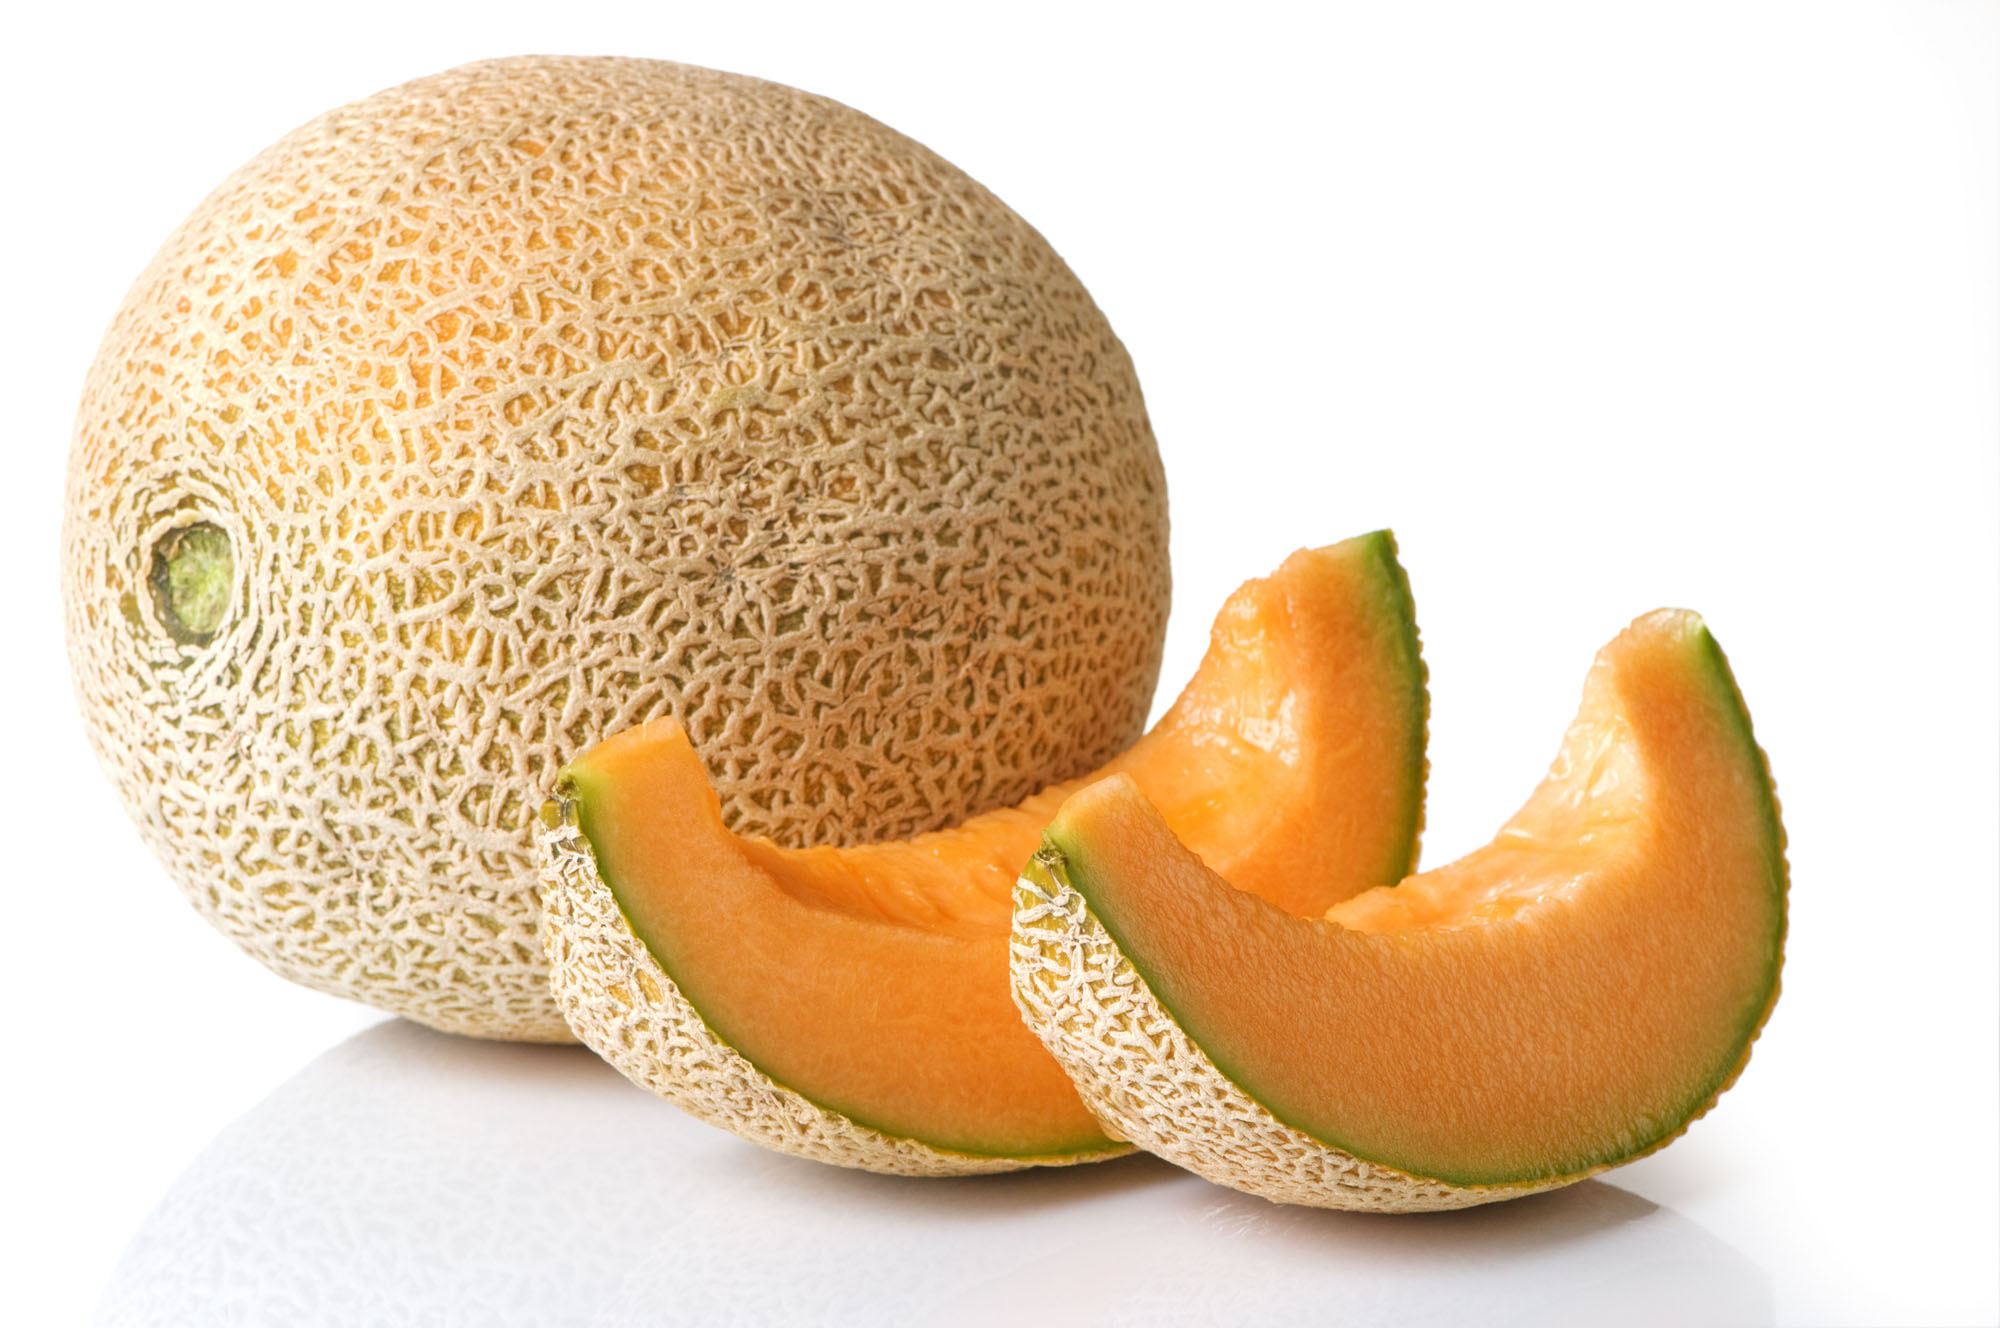 Melon Cantaloupe, und